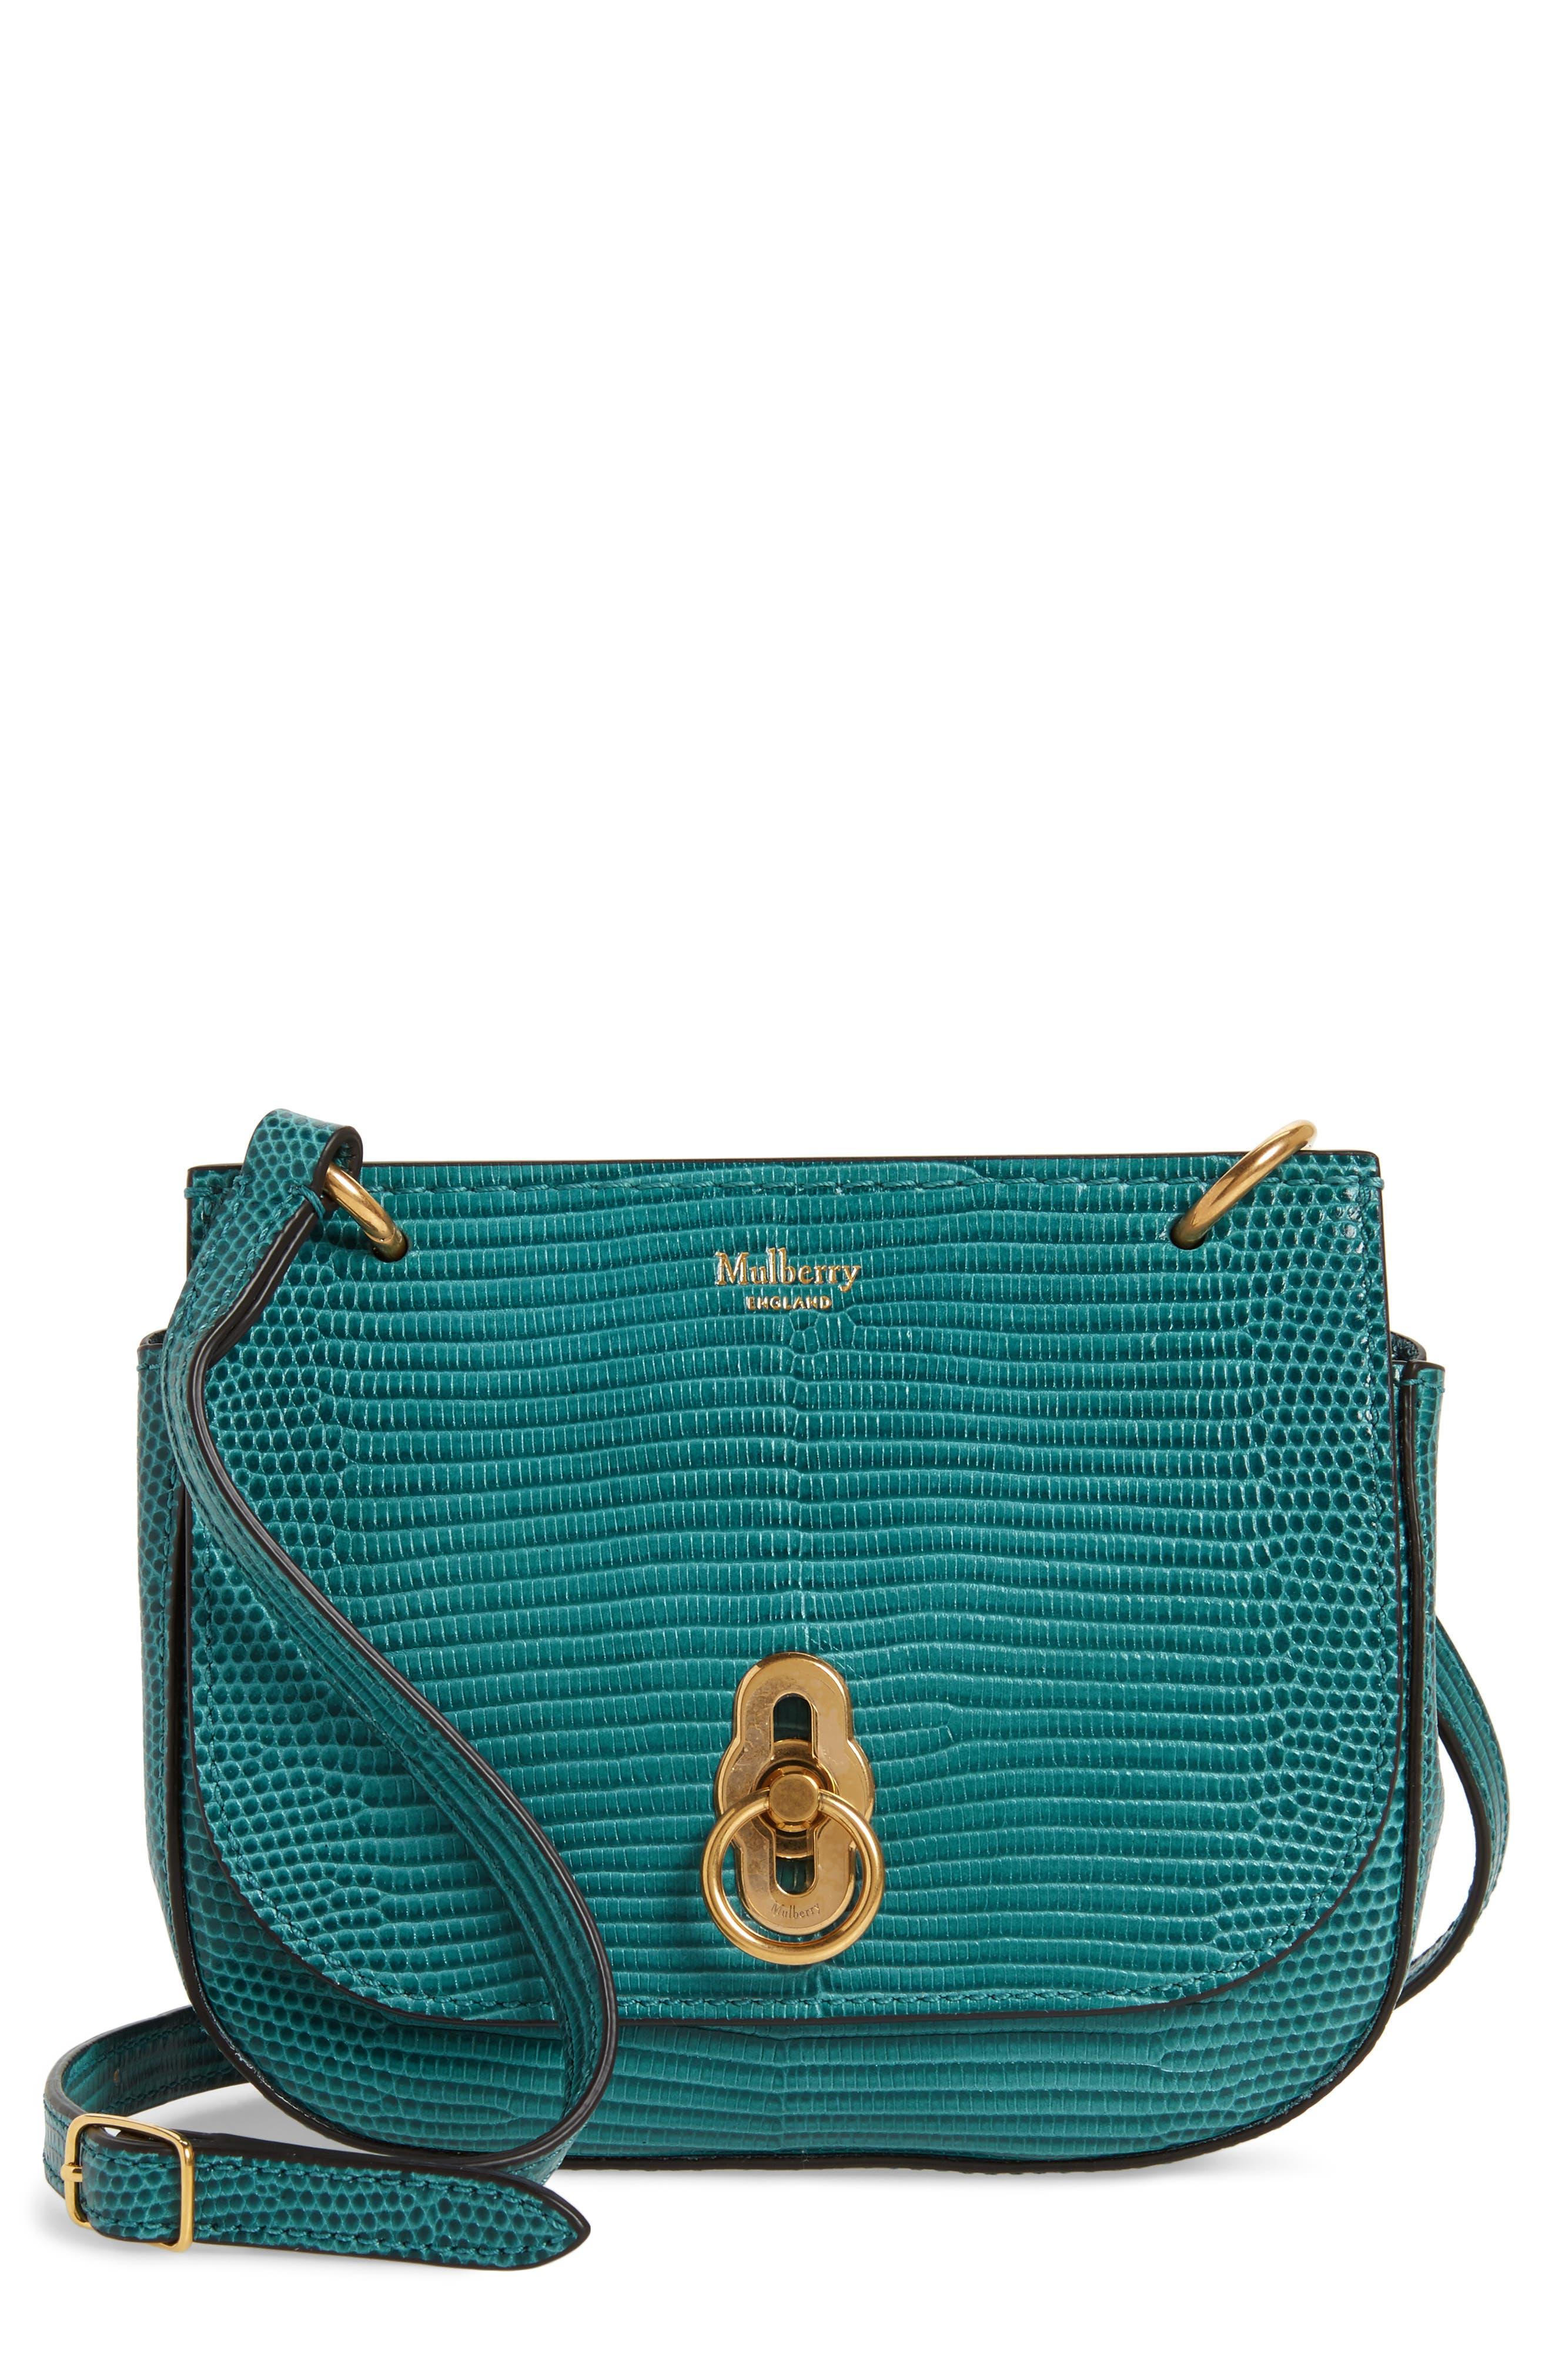 Alternate Image 1 Selected - Mulberry Mini Amberley Reptile Embossed Leather Crossbody Bag